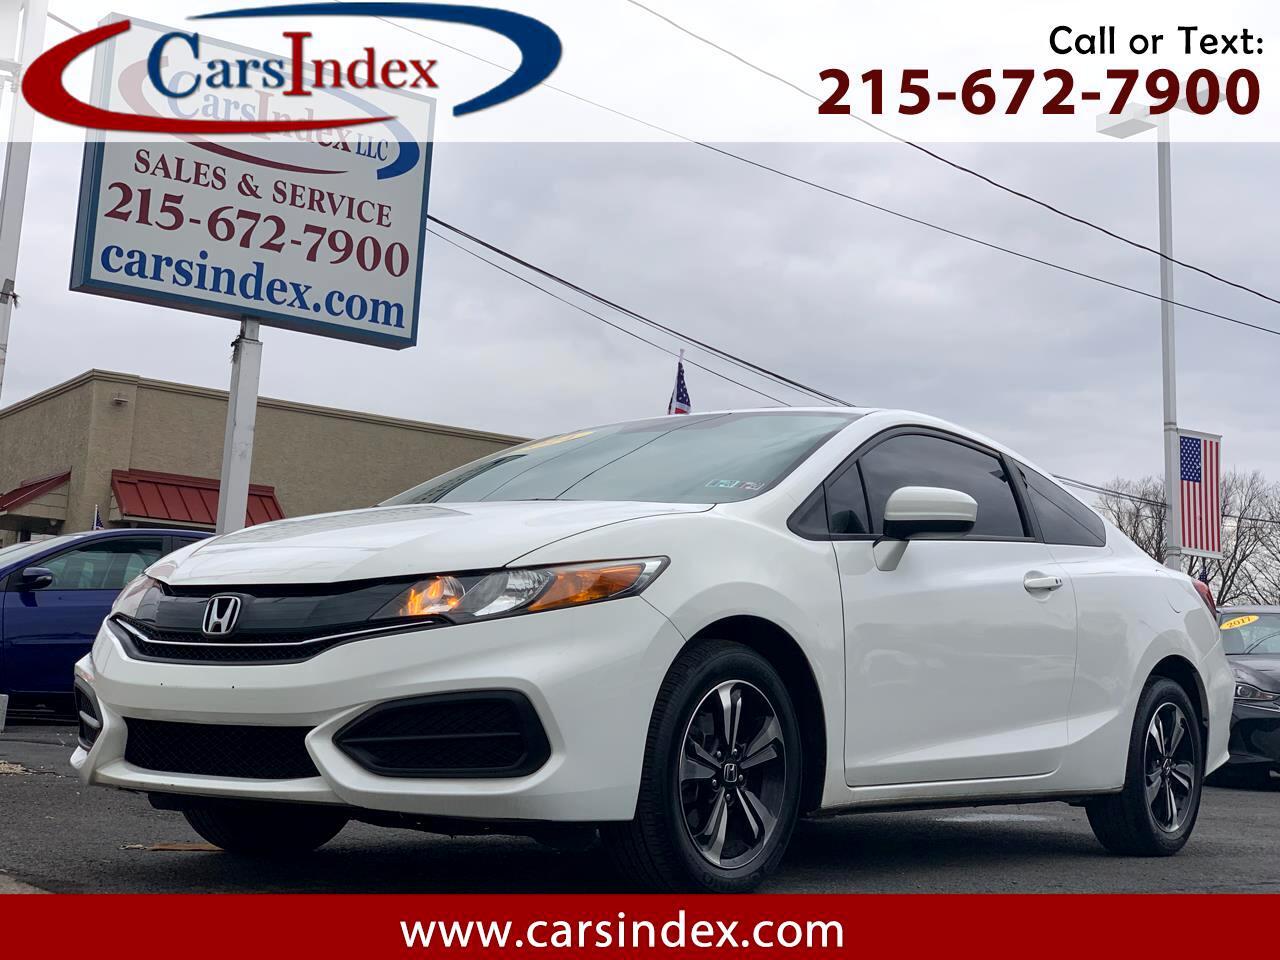 Honda Civic Coupe 2dr CVT EX 2014